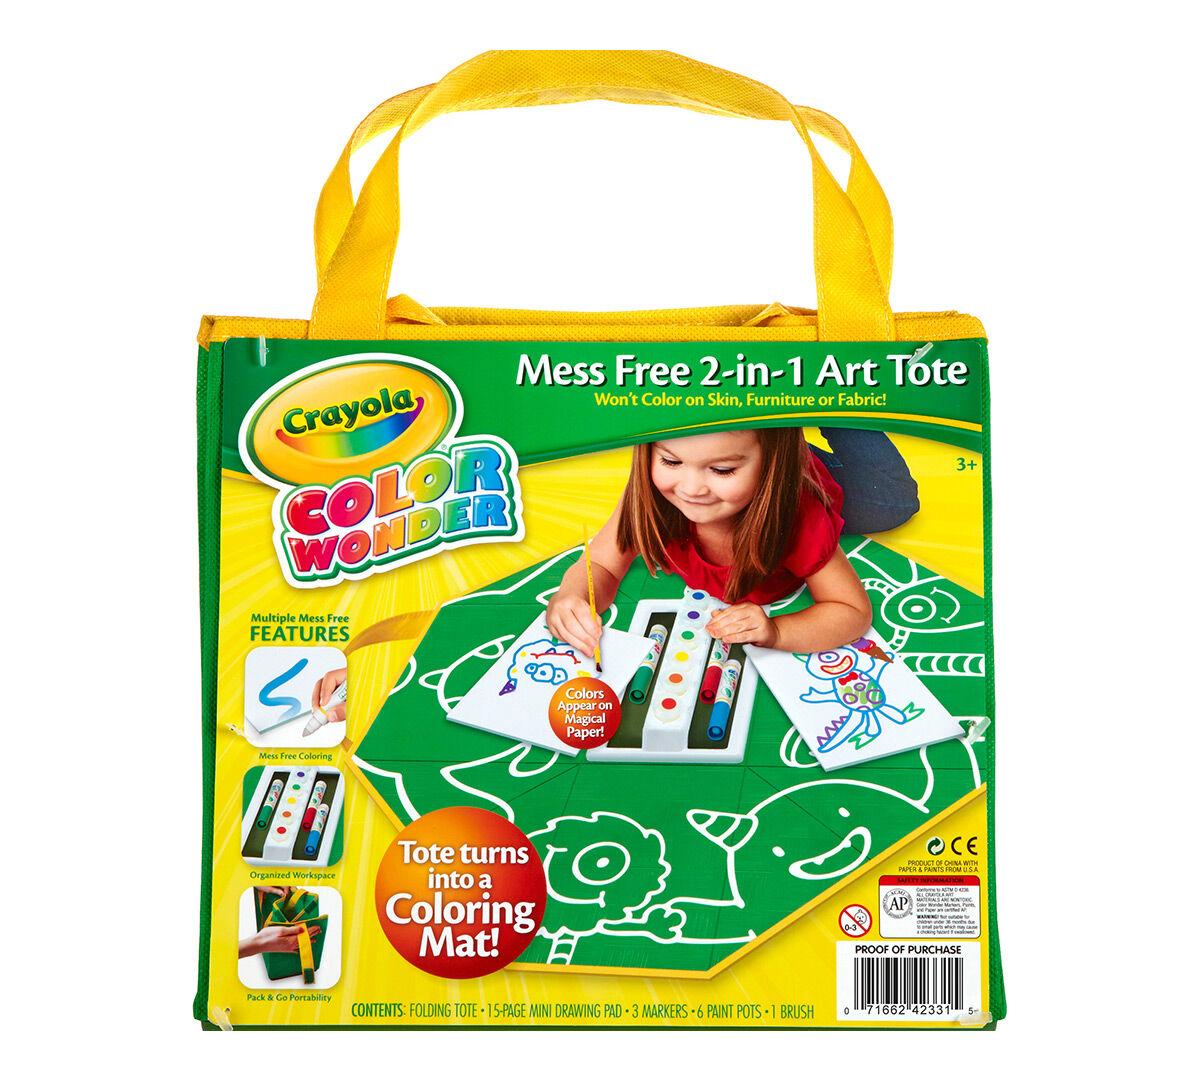 Color Wonder Mess Free 2-in-1 Art Tote - Crayola